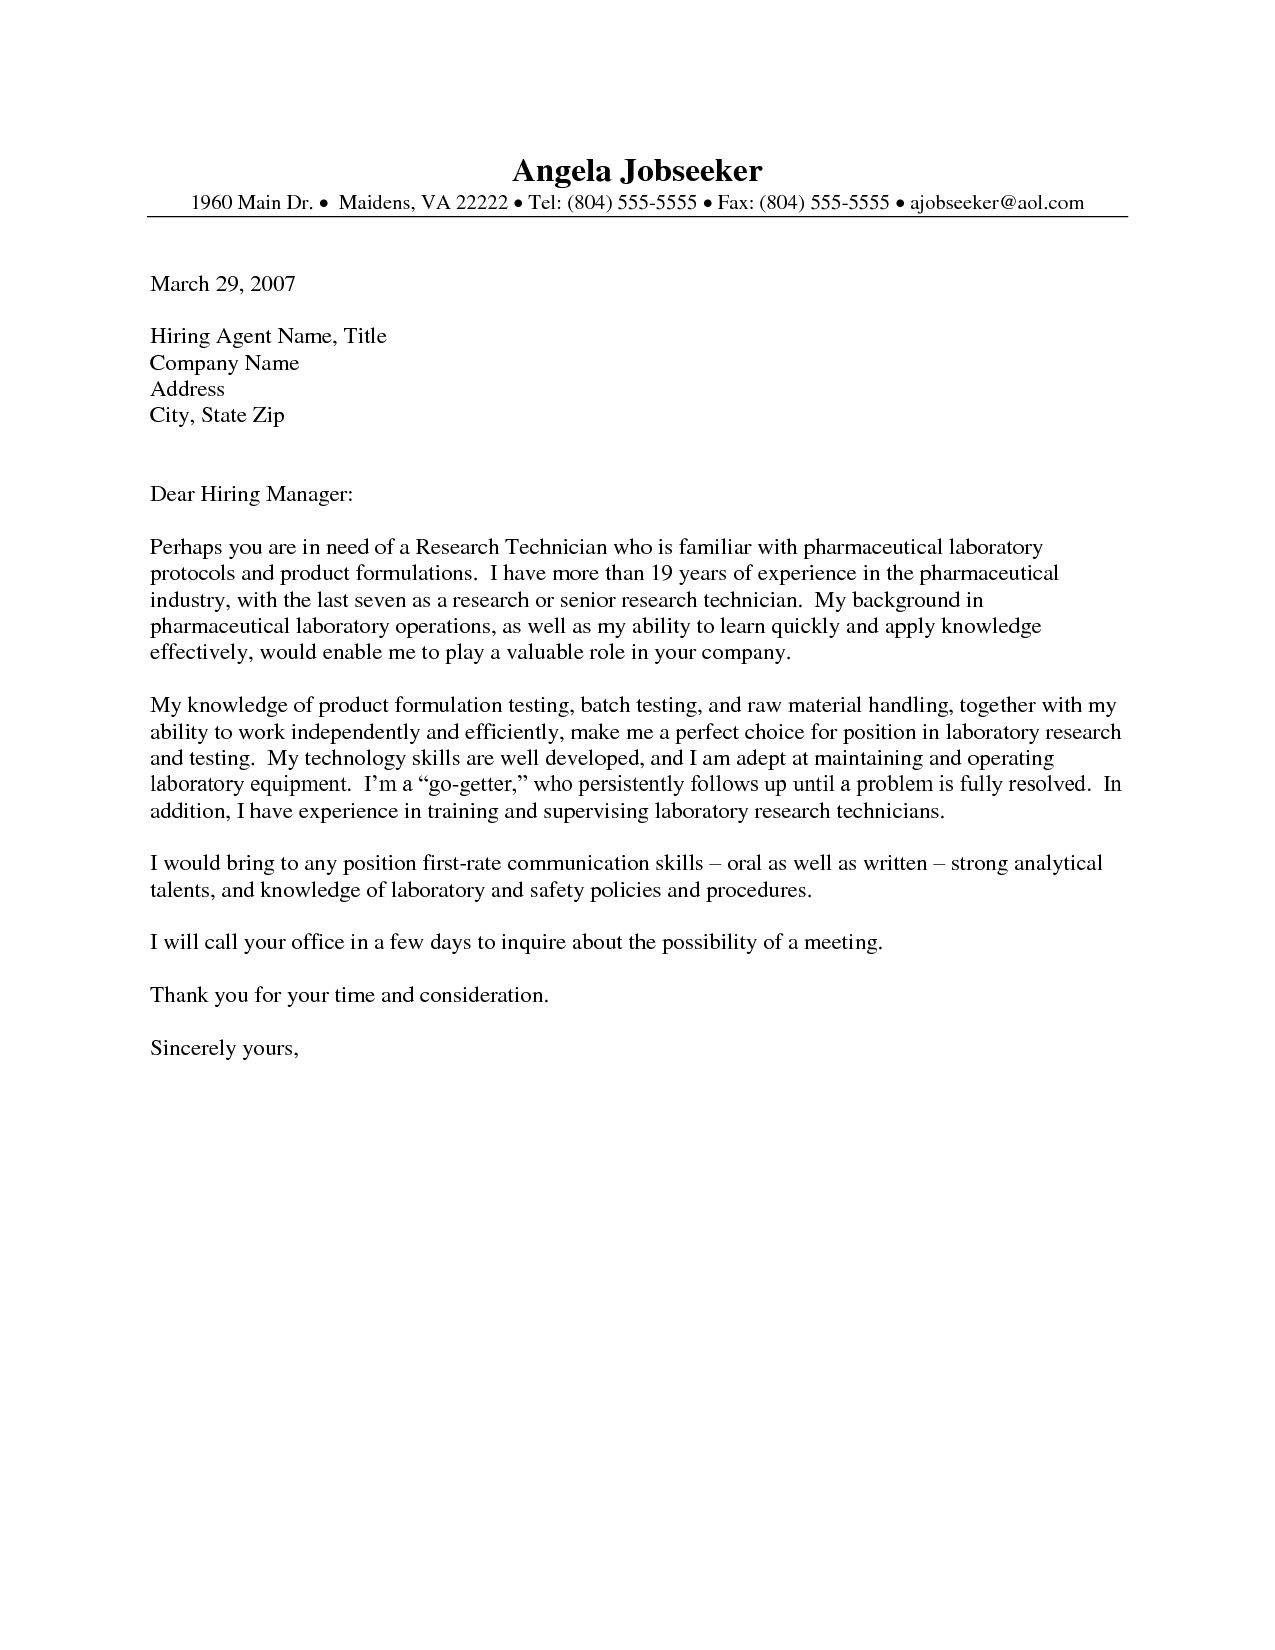 27+ pharmacy technician cover letter for senior accountant job description resume objective child care simple career fresh graduate